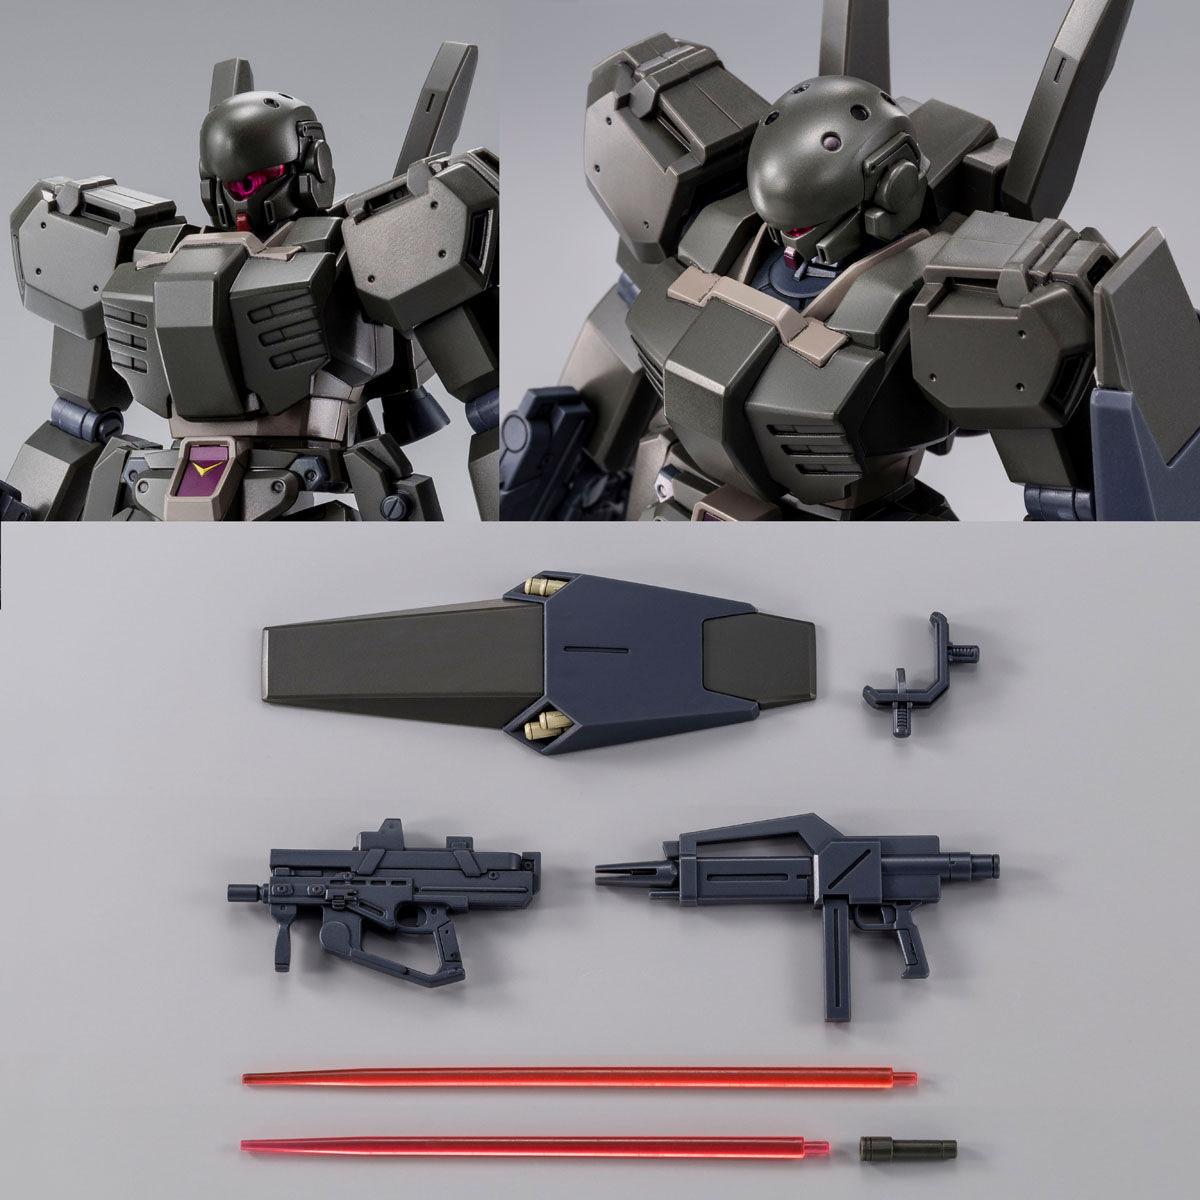 HG 1/144『ジェガンD型 (護衛隊仕様)』機動戦士ガンダムNT プラモデル-010